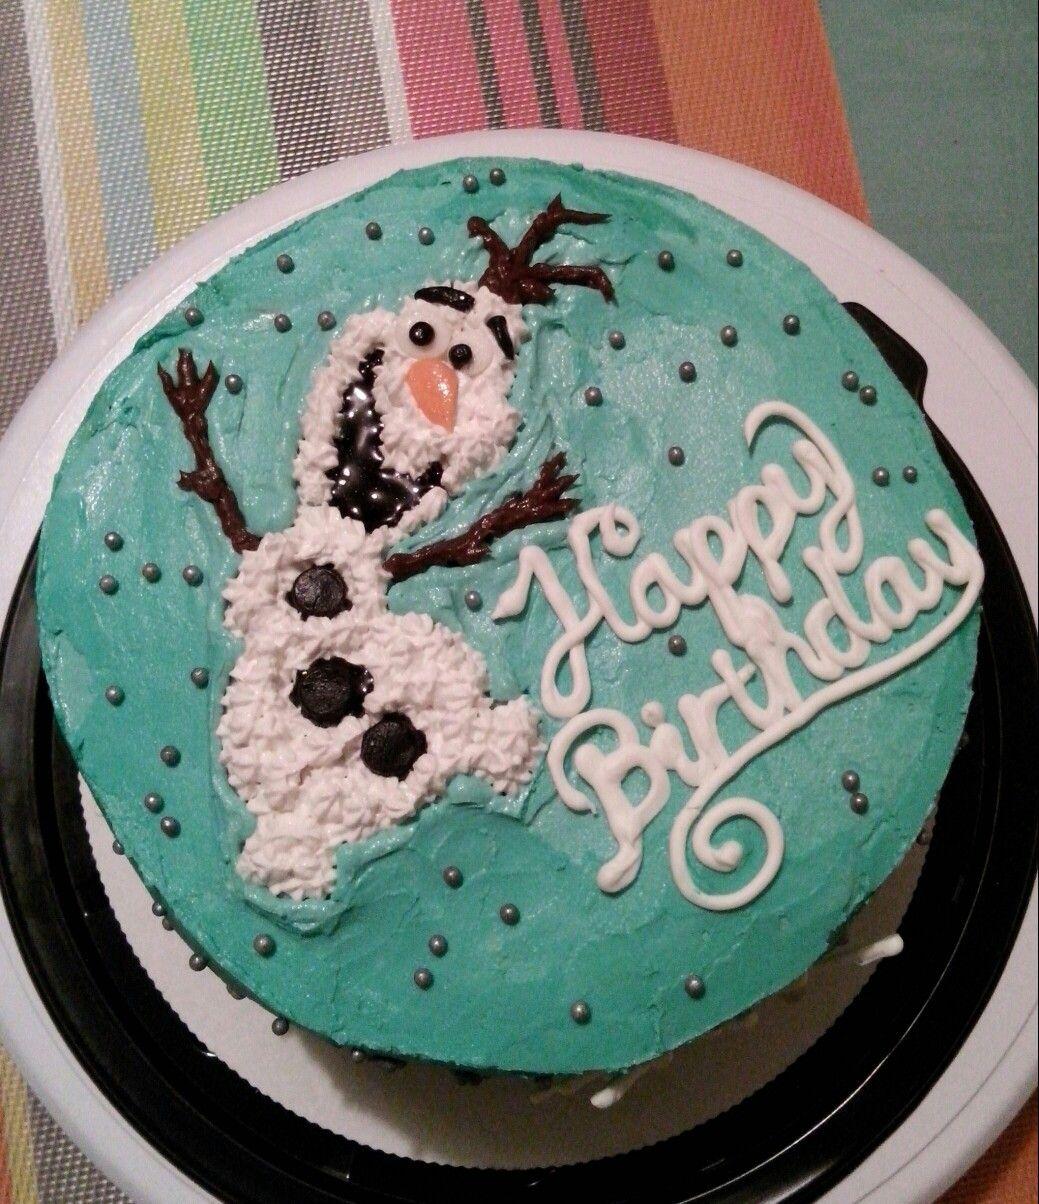 Olaf birthday cake pastel casero 100% fresh homemade baking #tulipáncupcakes en facebook